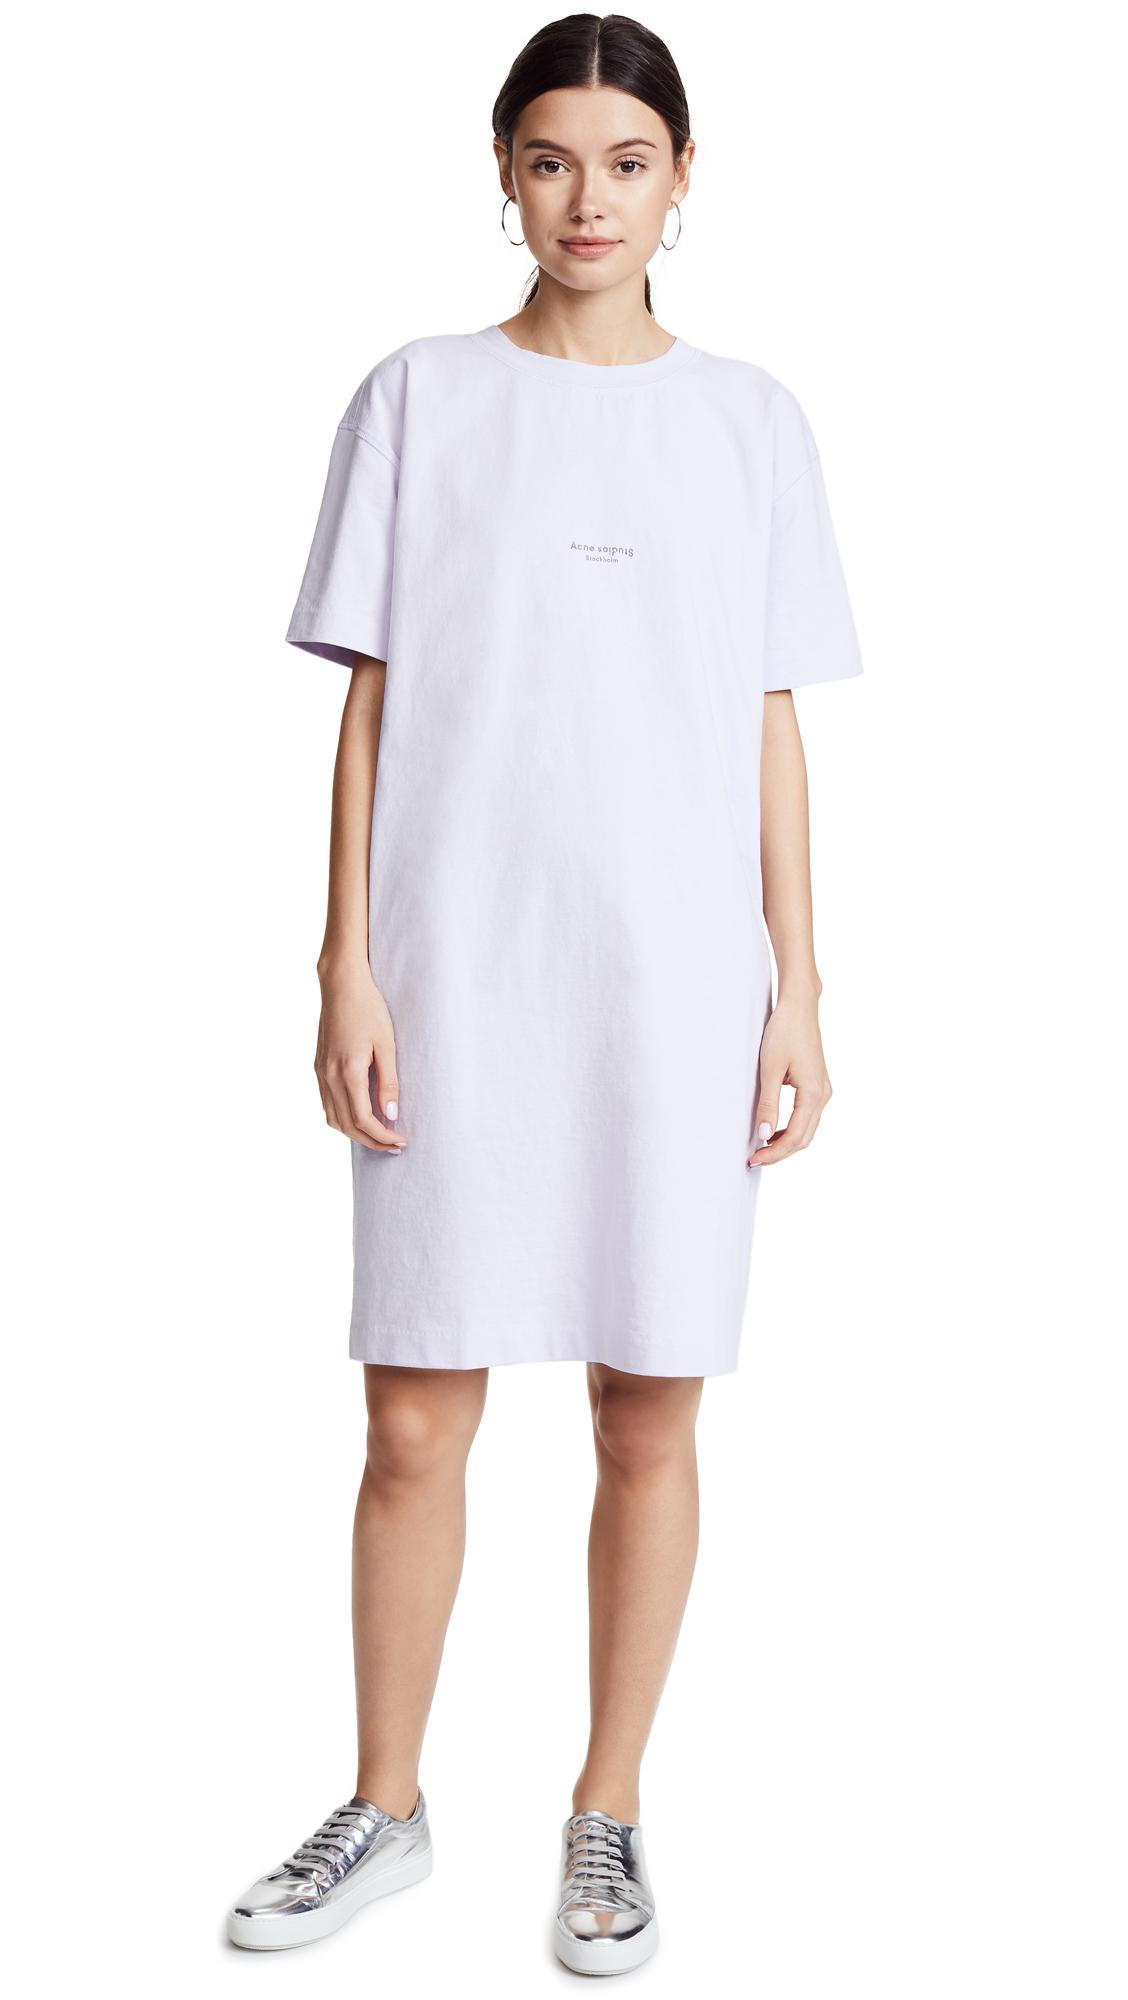 Acne Studios Jopa Tee Dress - Chalk Lilac